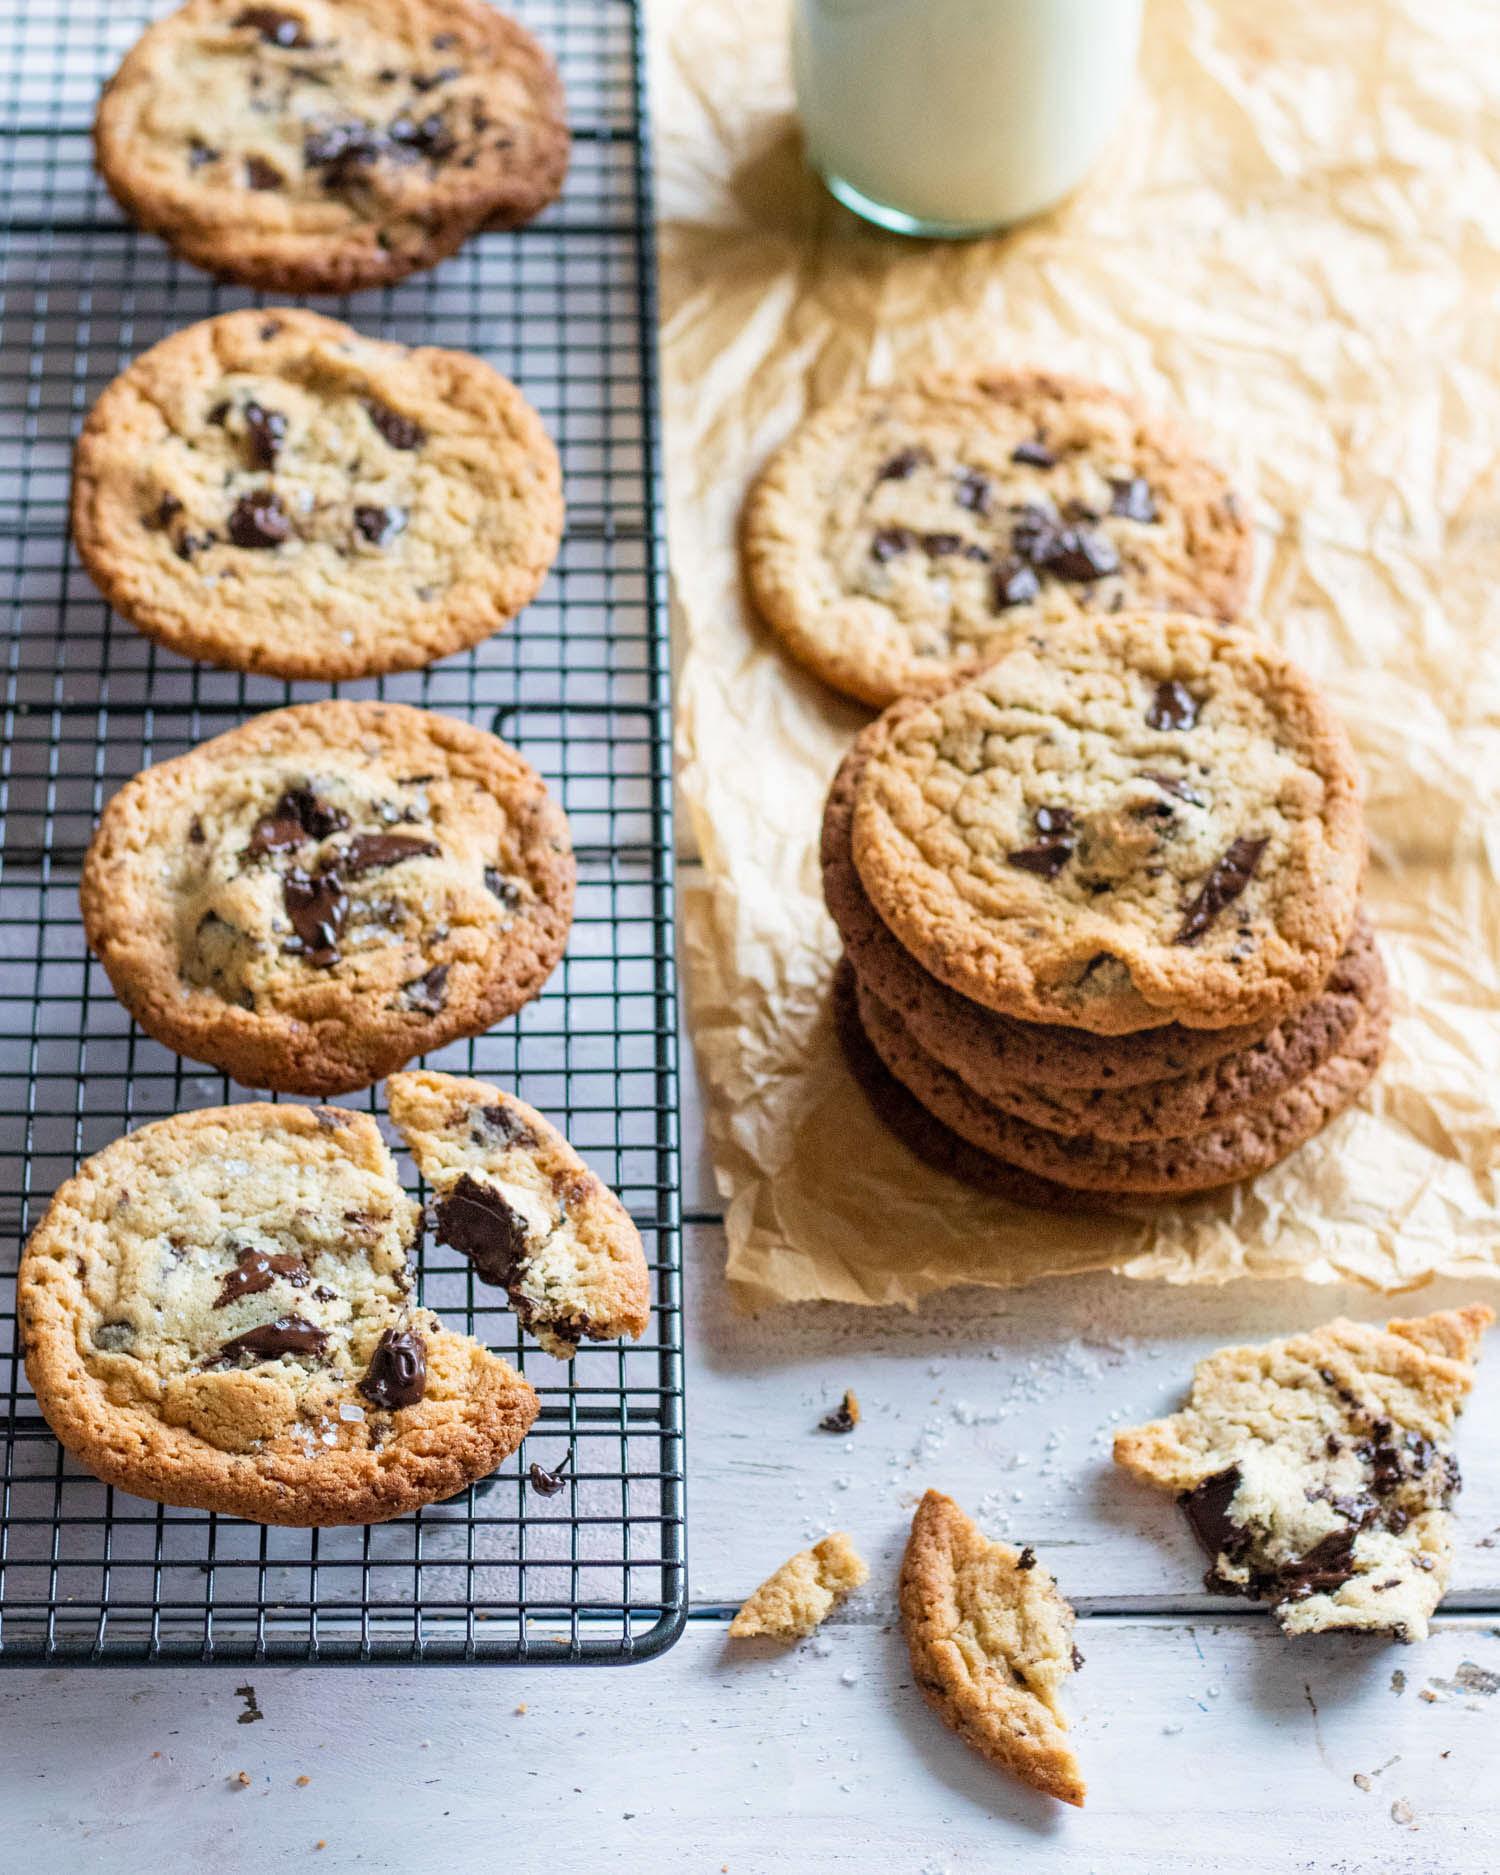 tahini-chocolate-chip-cookies-with-milk